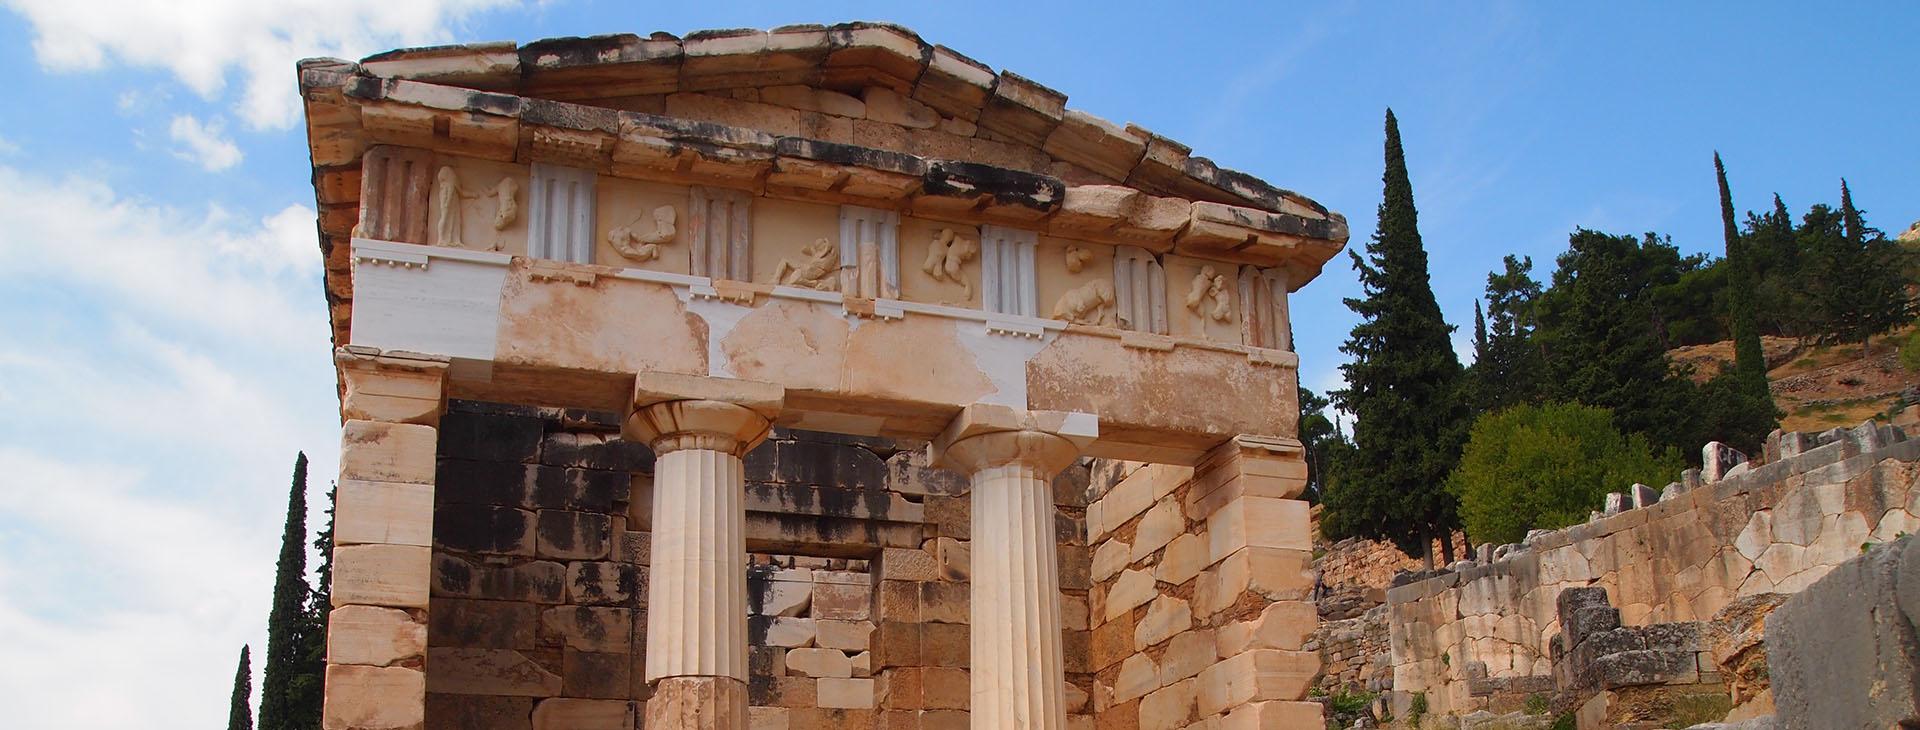 Delphi, Fokis